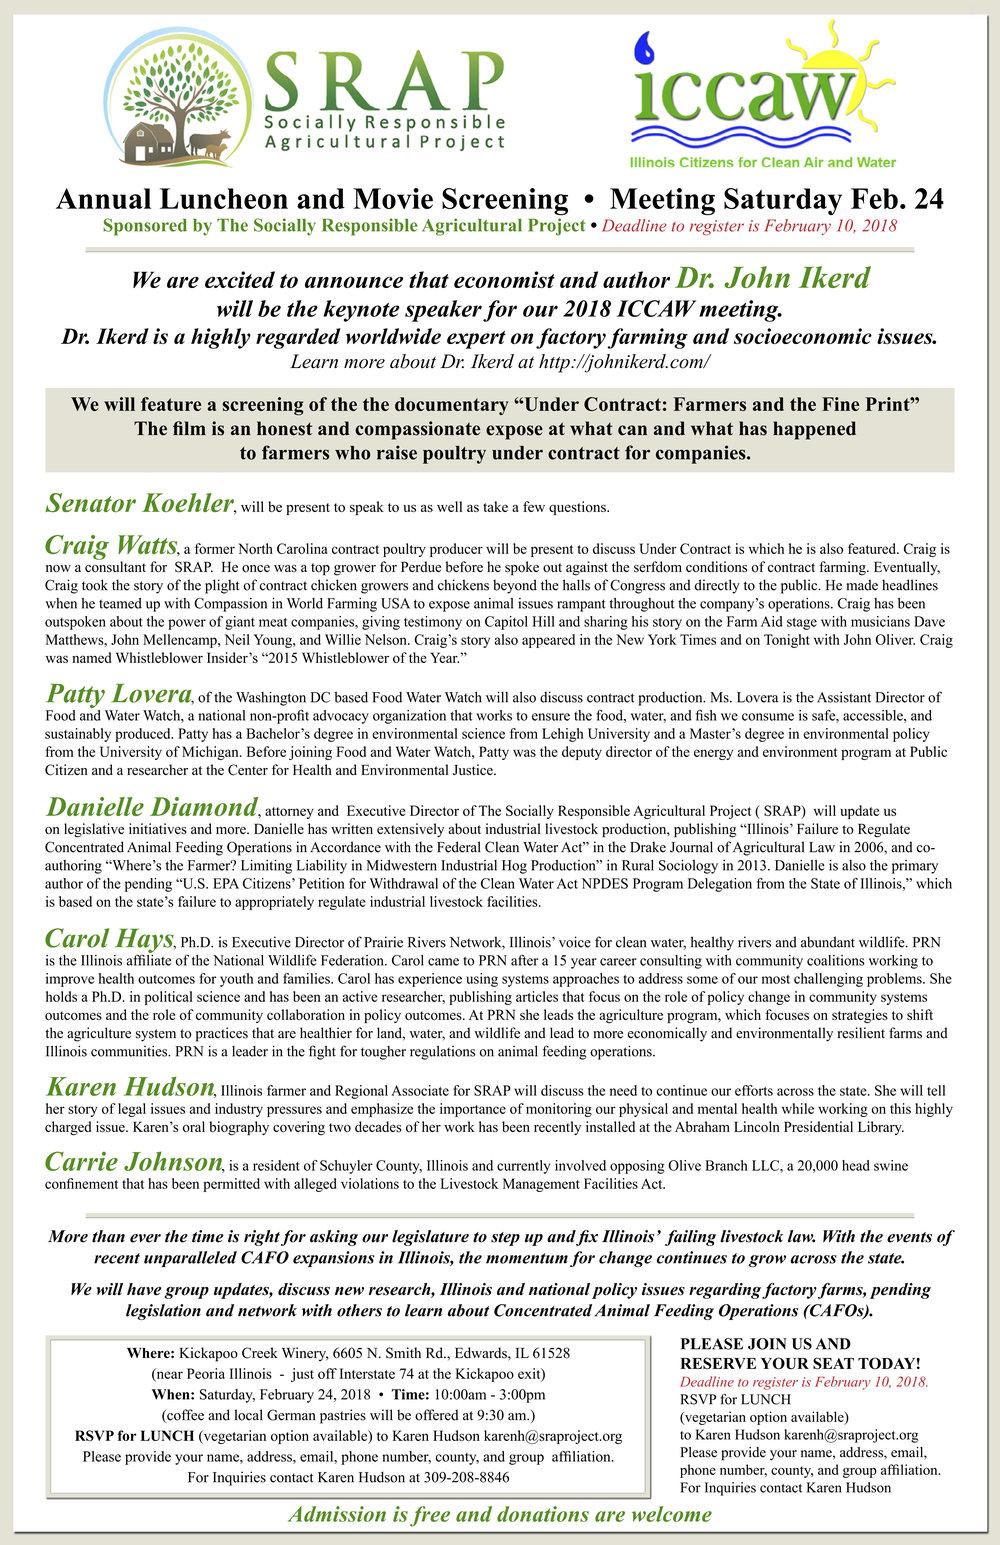 ICCAW-February-24-KickapooWinery.jpg